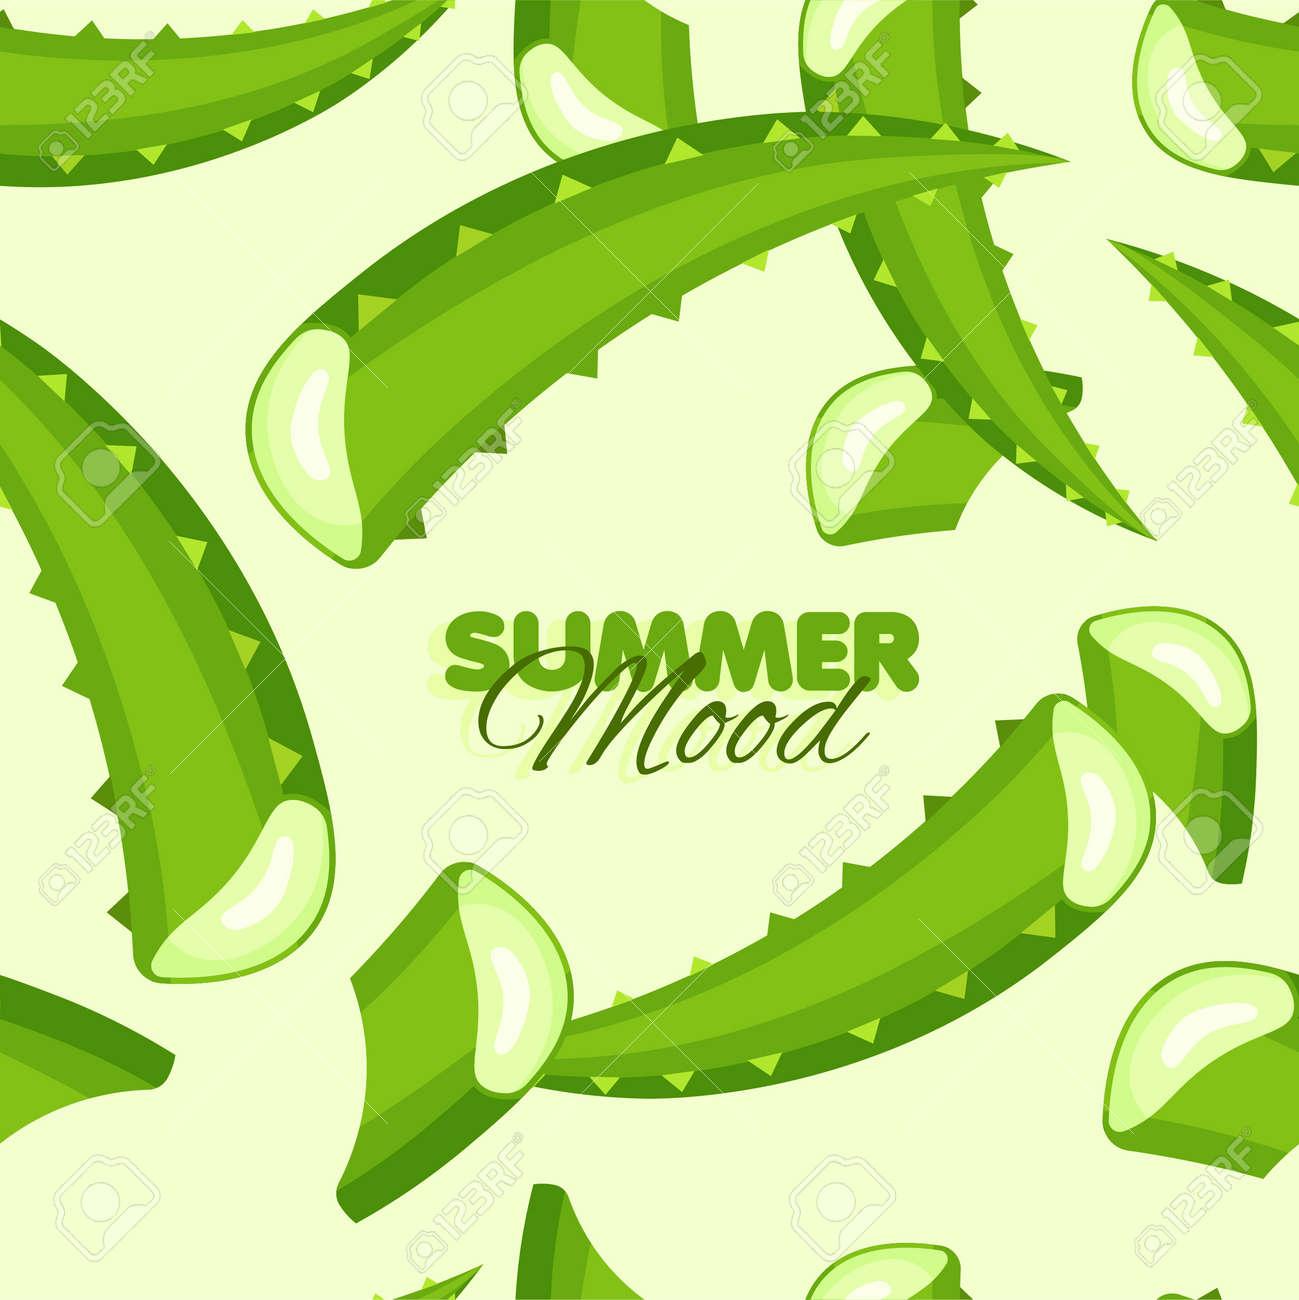 Aloe leaves seamless pattern. Summer banner with floral background. Herbal botanical design. Vector illustration. - 170248532